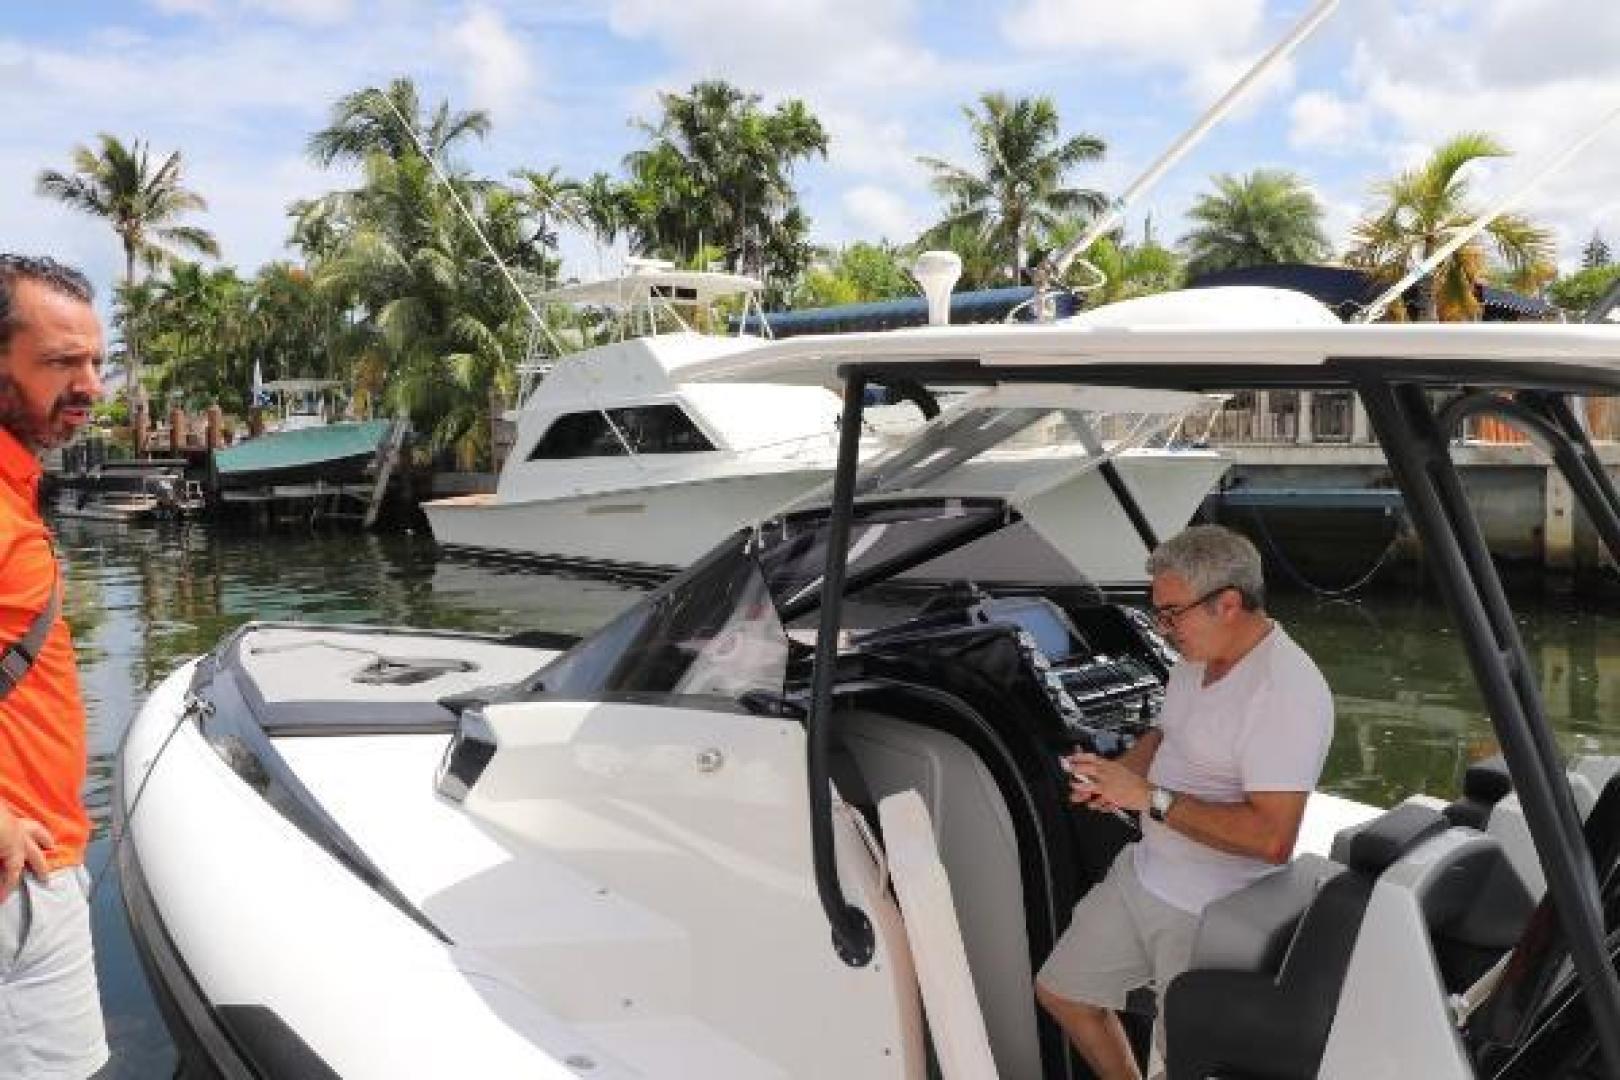 Sacs-Strider 40 ESSE R 2016-Sacs Strider 40 ESSE R Fort Lauderdale-Florida-United States-1533415   Thumbnail